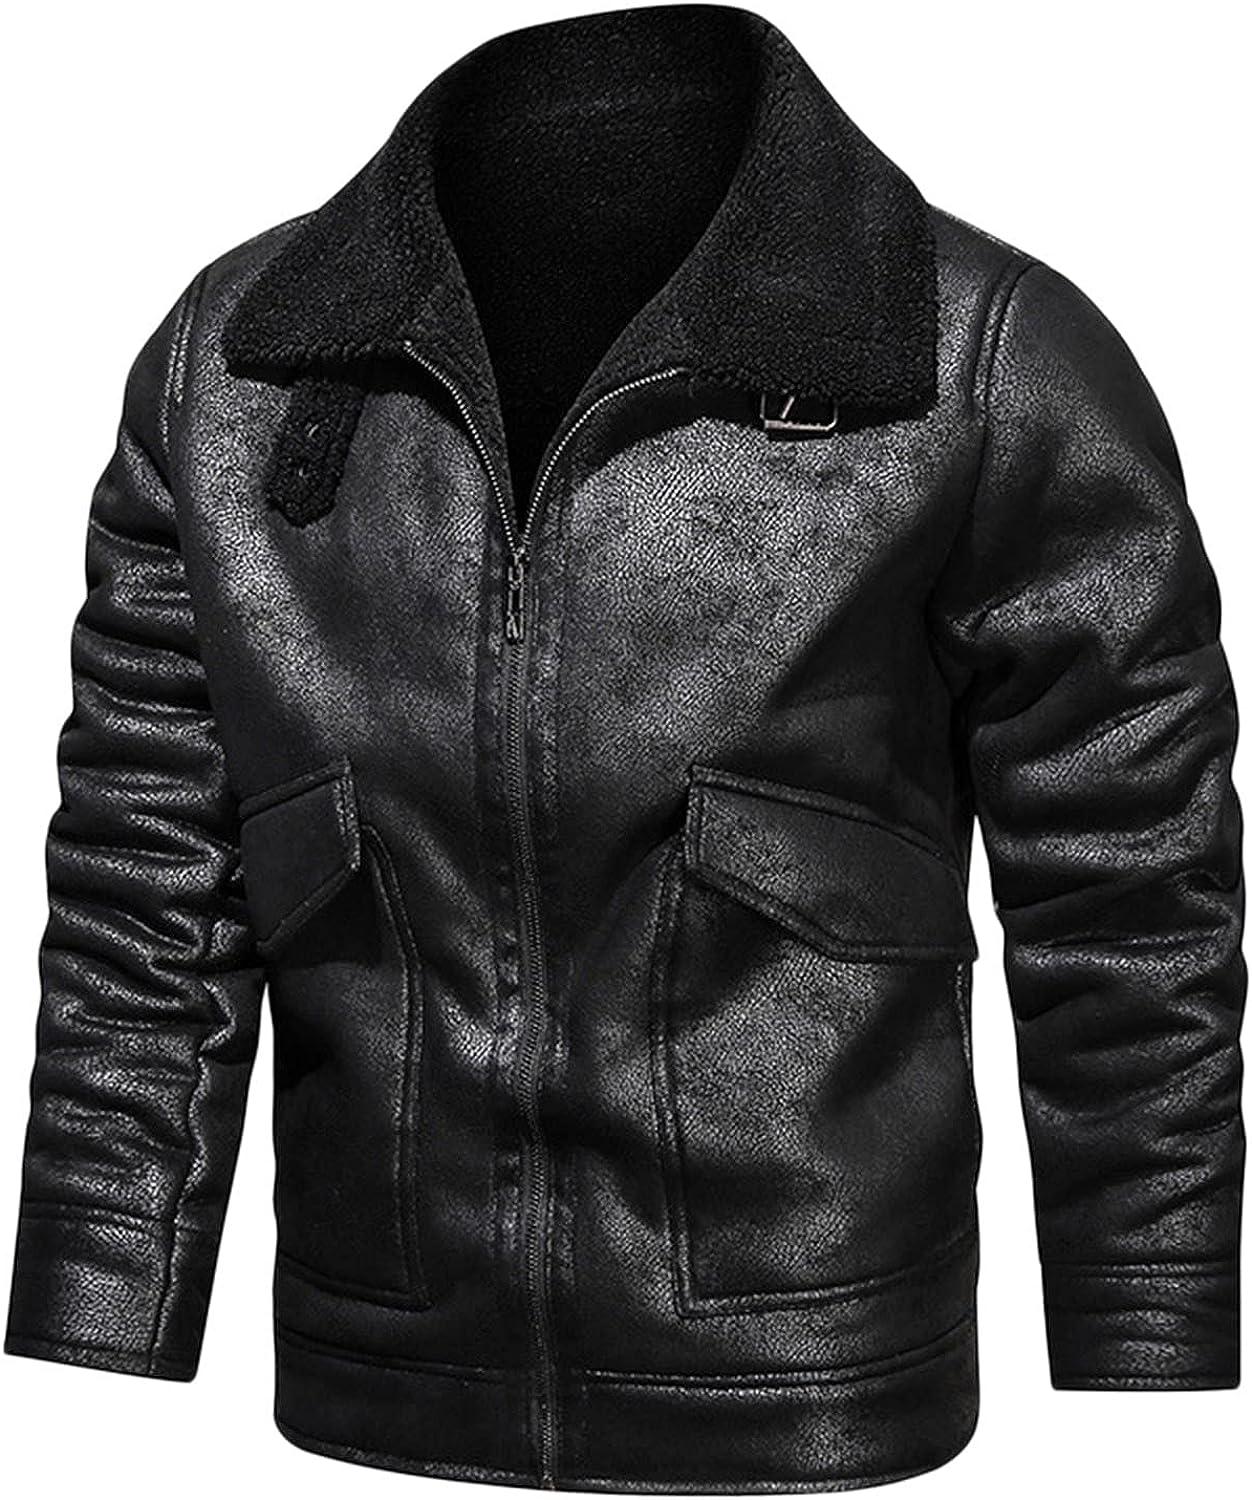 Men's Fleece Lined Business Lambskin Max 53% OFF Ranking TOP20 Blazer Jacket Leather Bombe